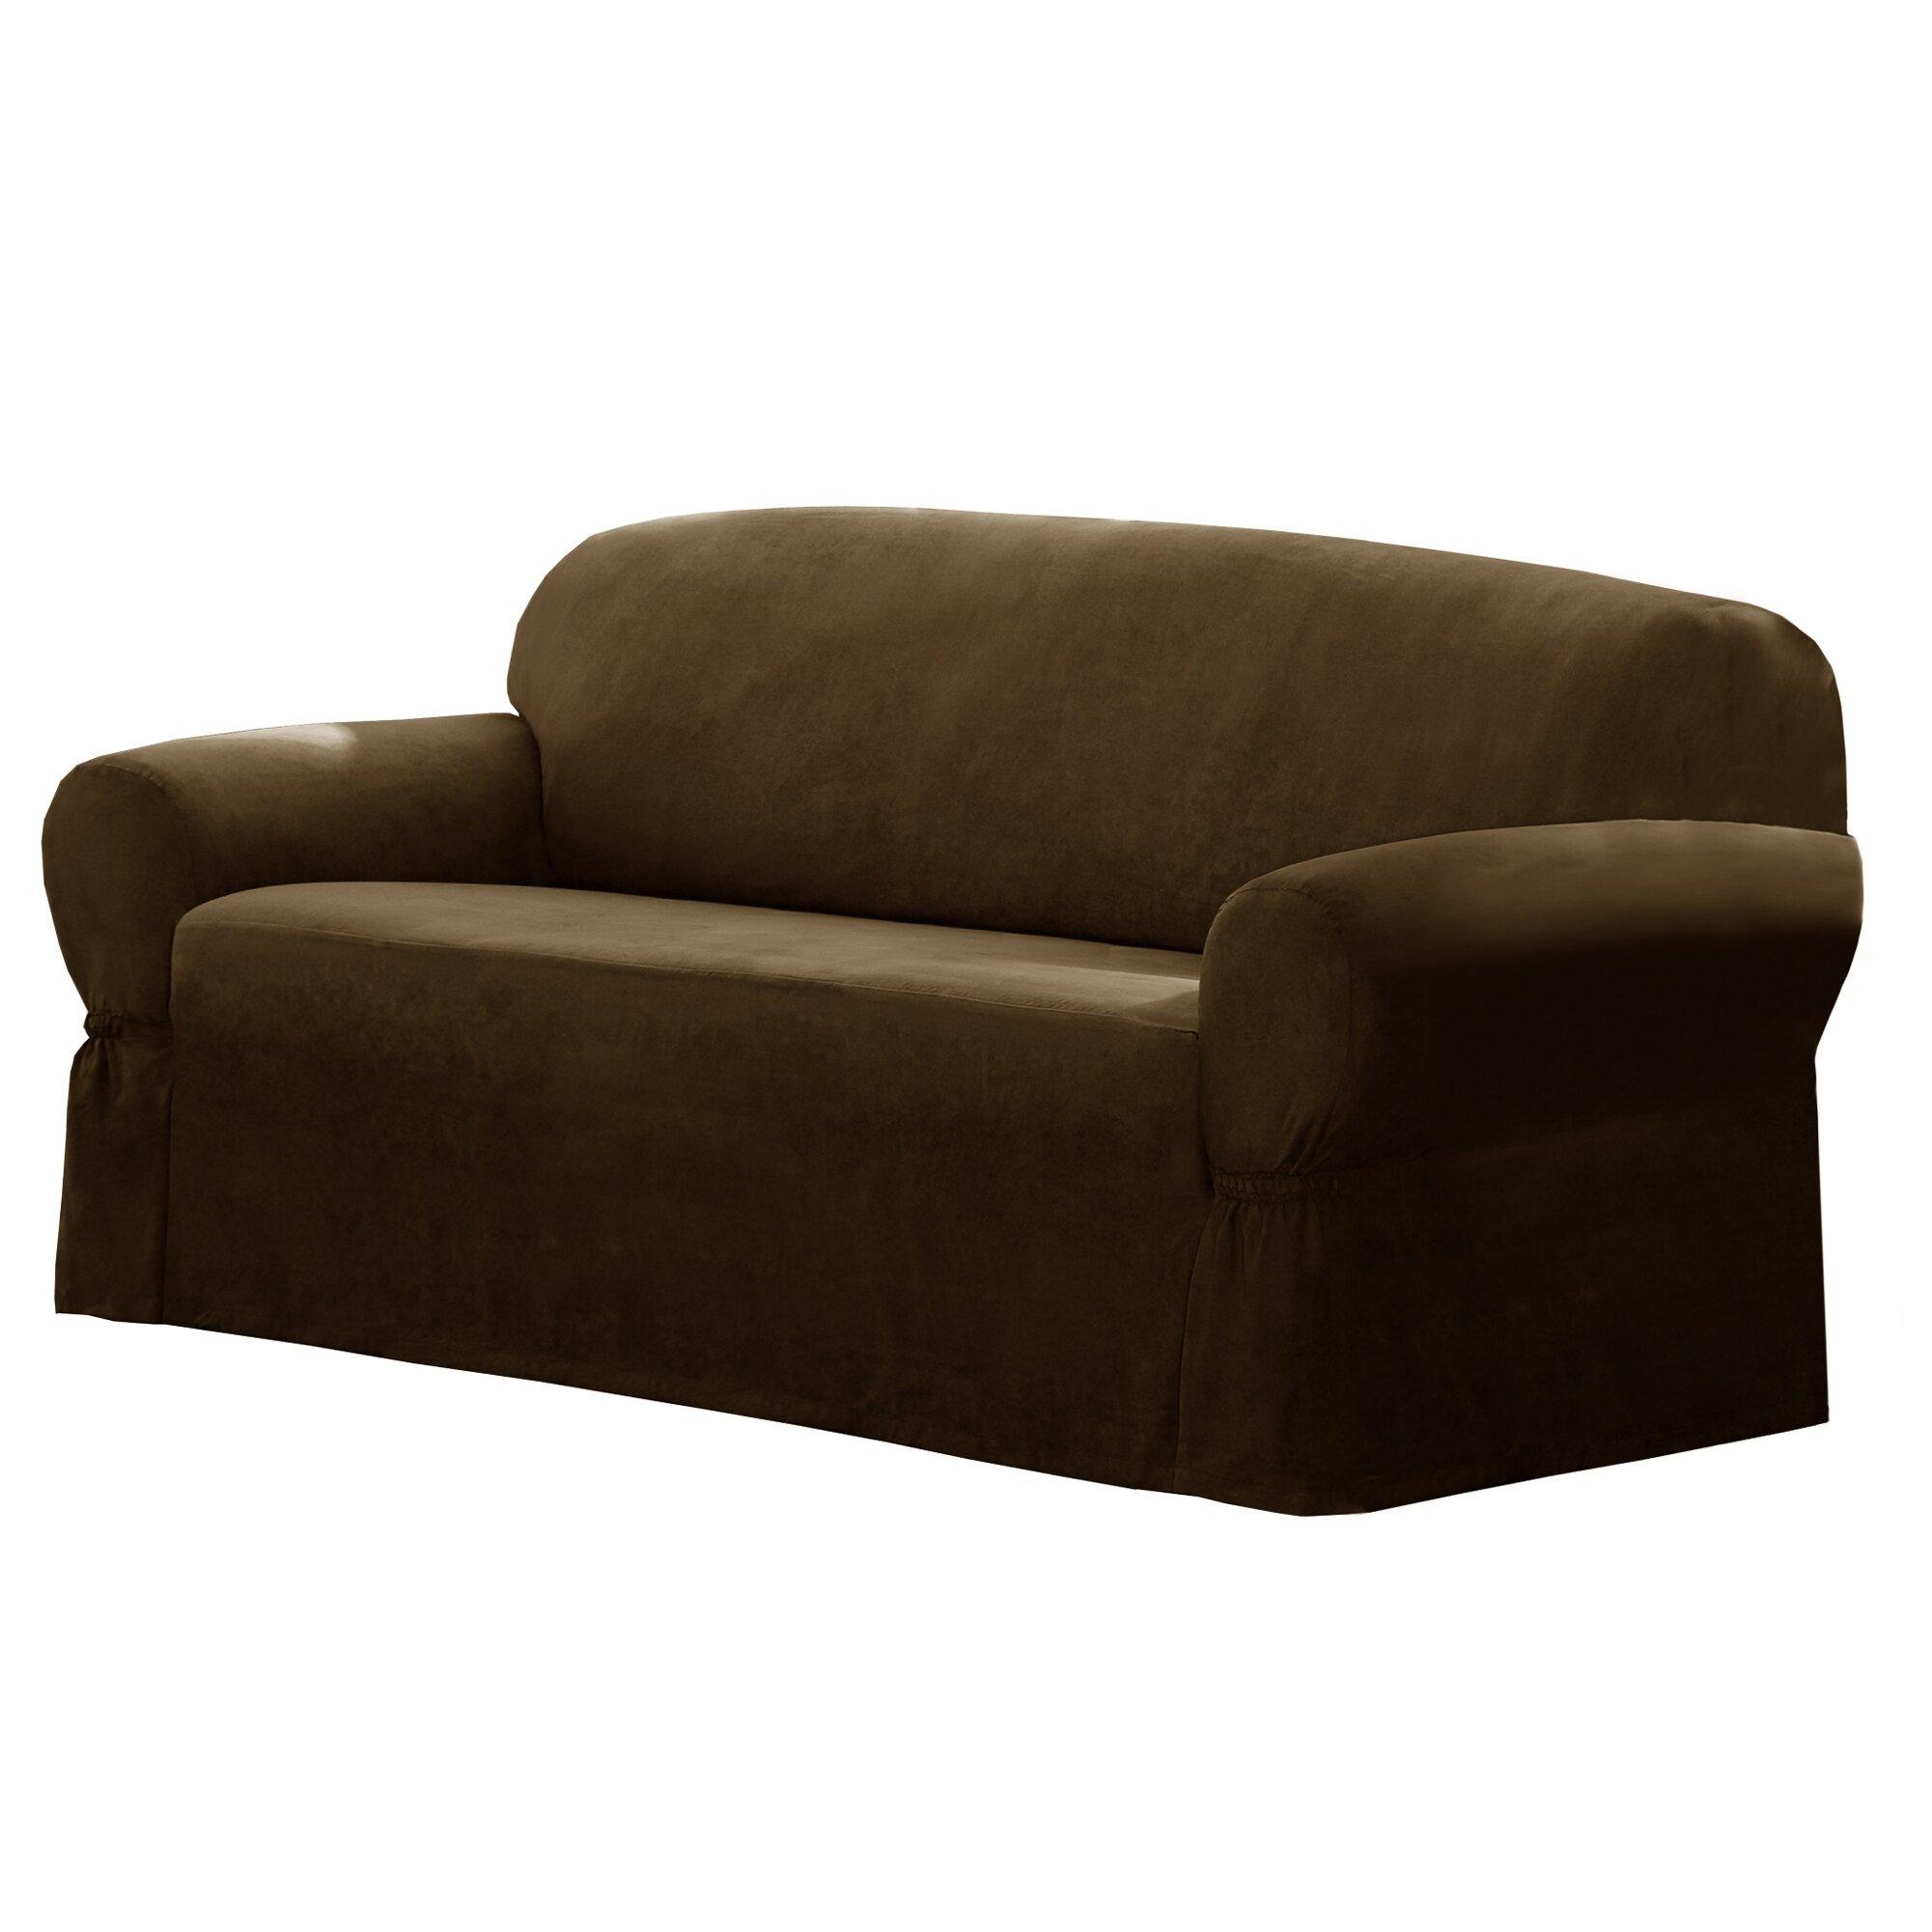 t cushion sofa slipcovers canada 28 images t cushion  : Maytex T Cushion Loveseat Sofa Slipcover from americanhomesforsale.us size 2001 x 2001 jpeg 238kB